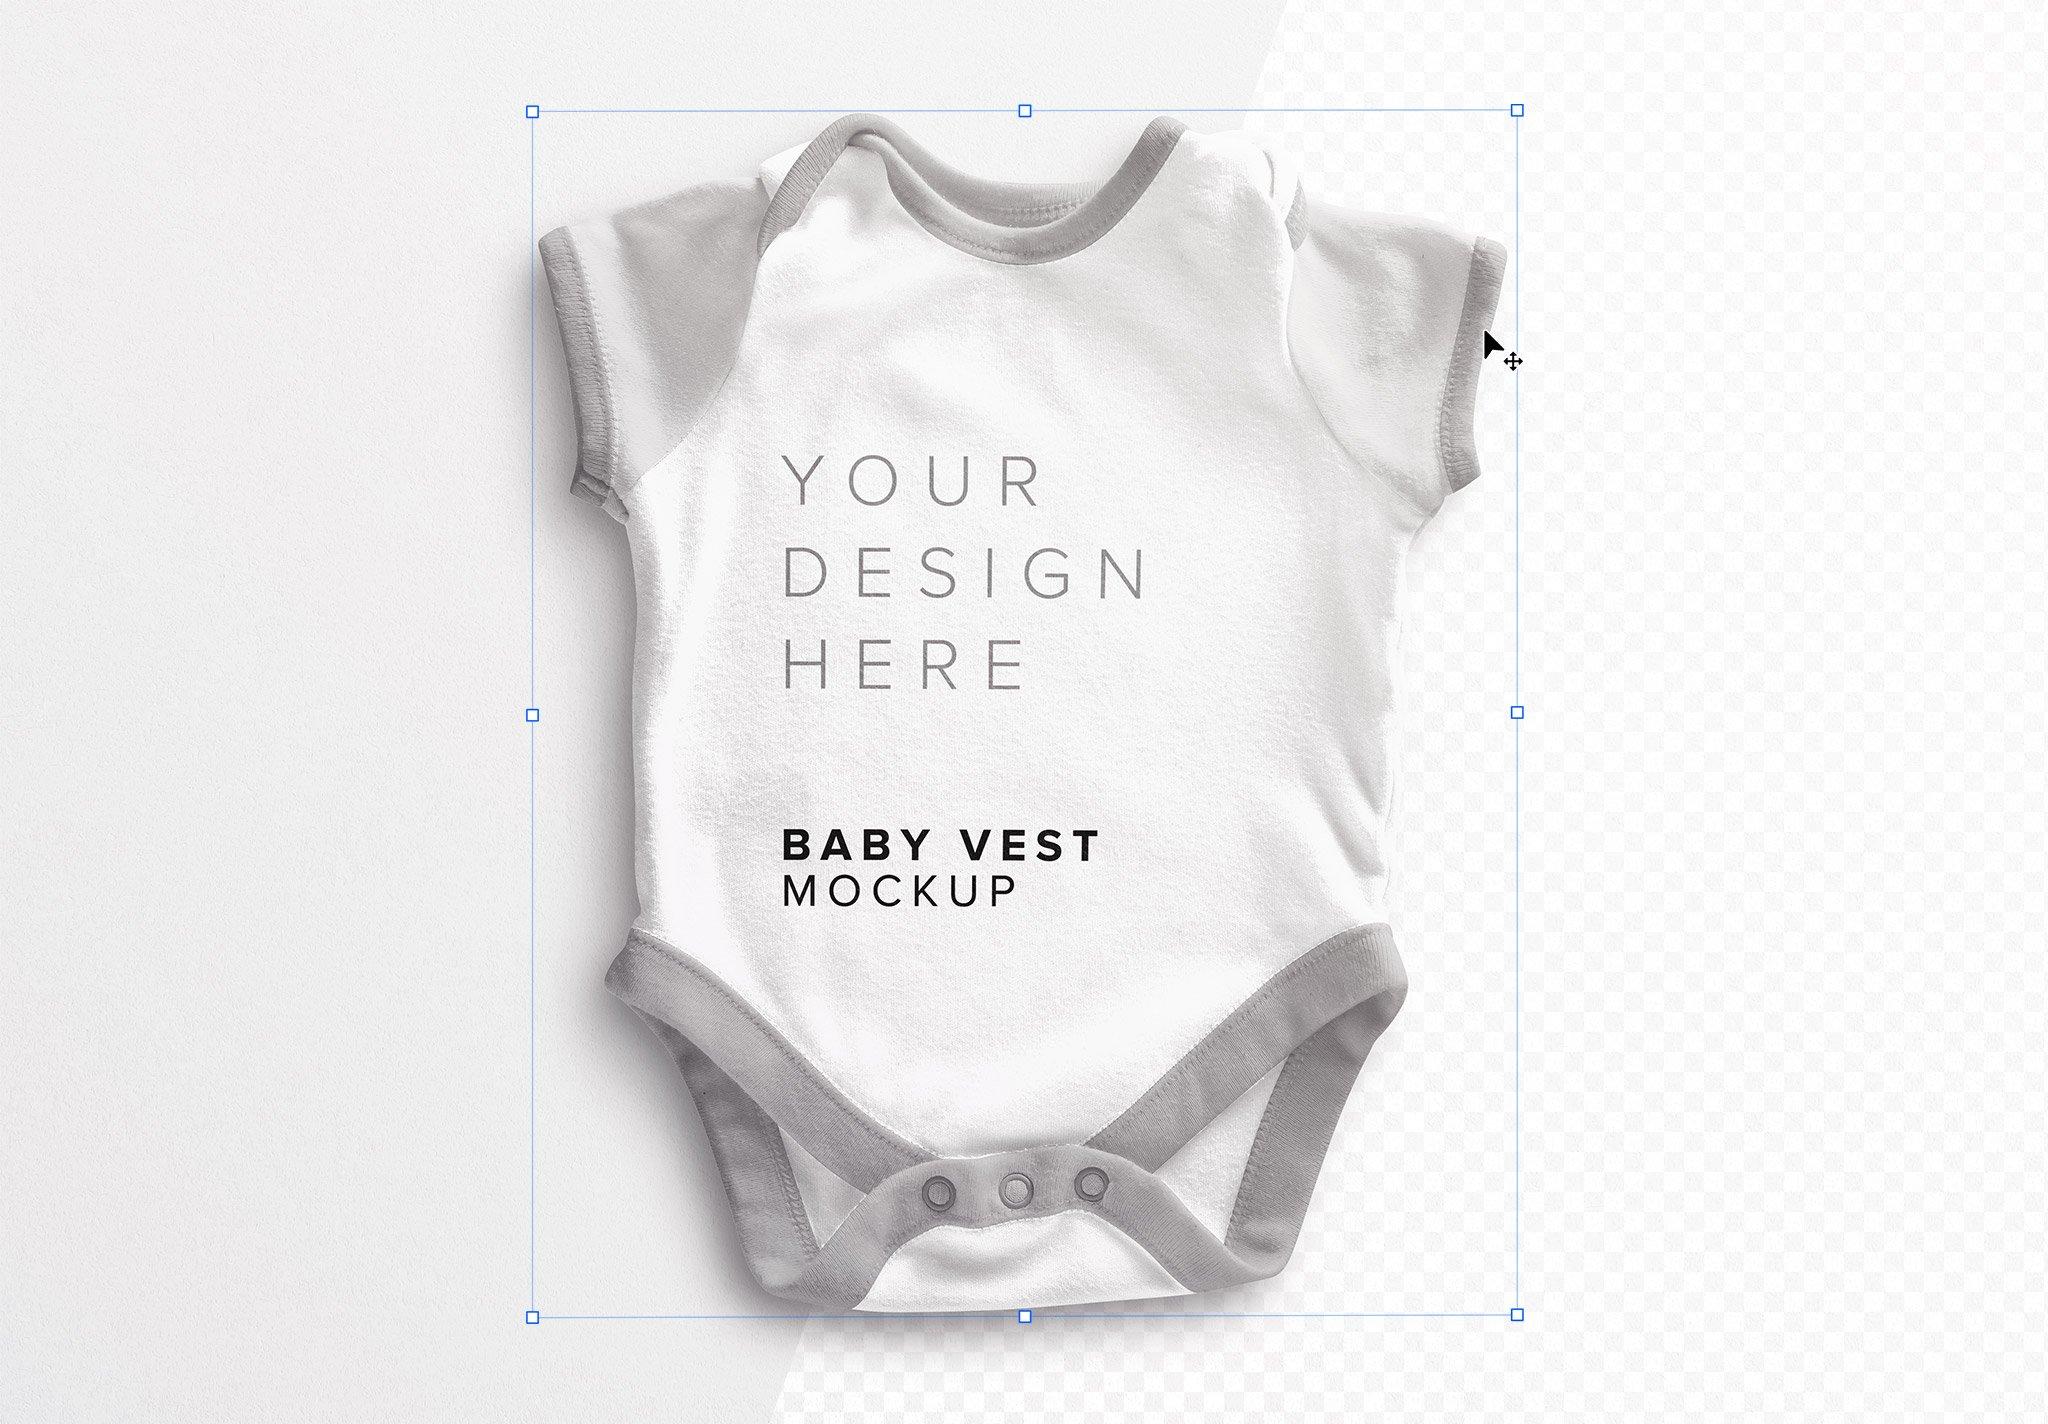 Baby Vest Mockup Image01